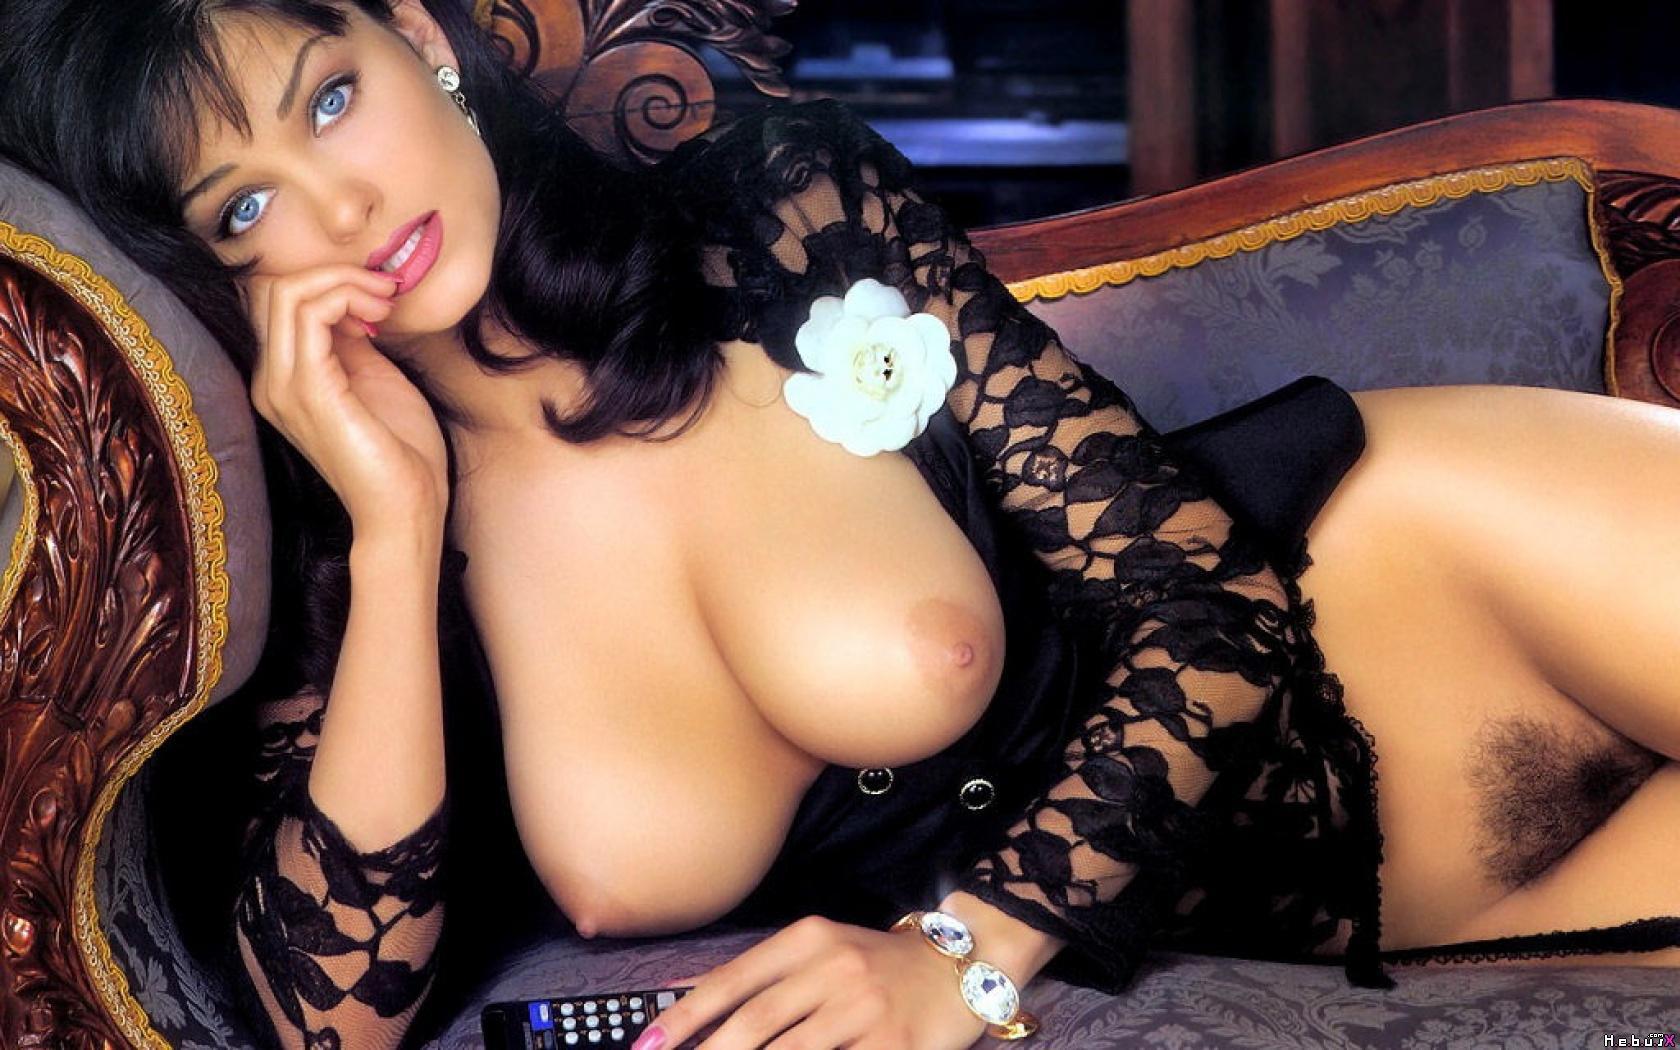 Denise richards in valentine 6